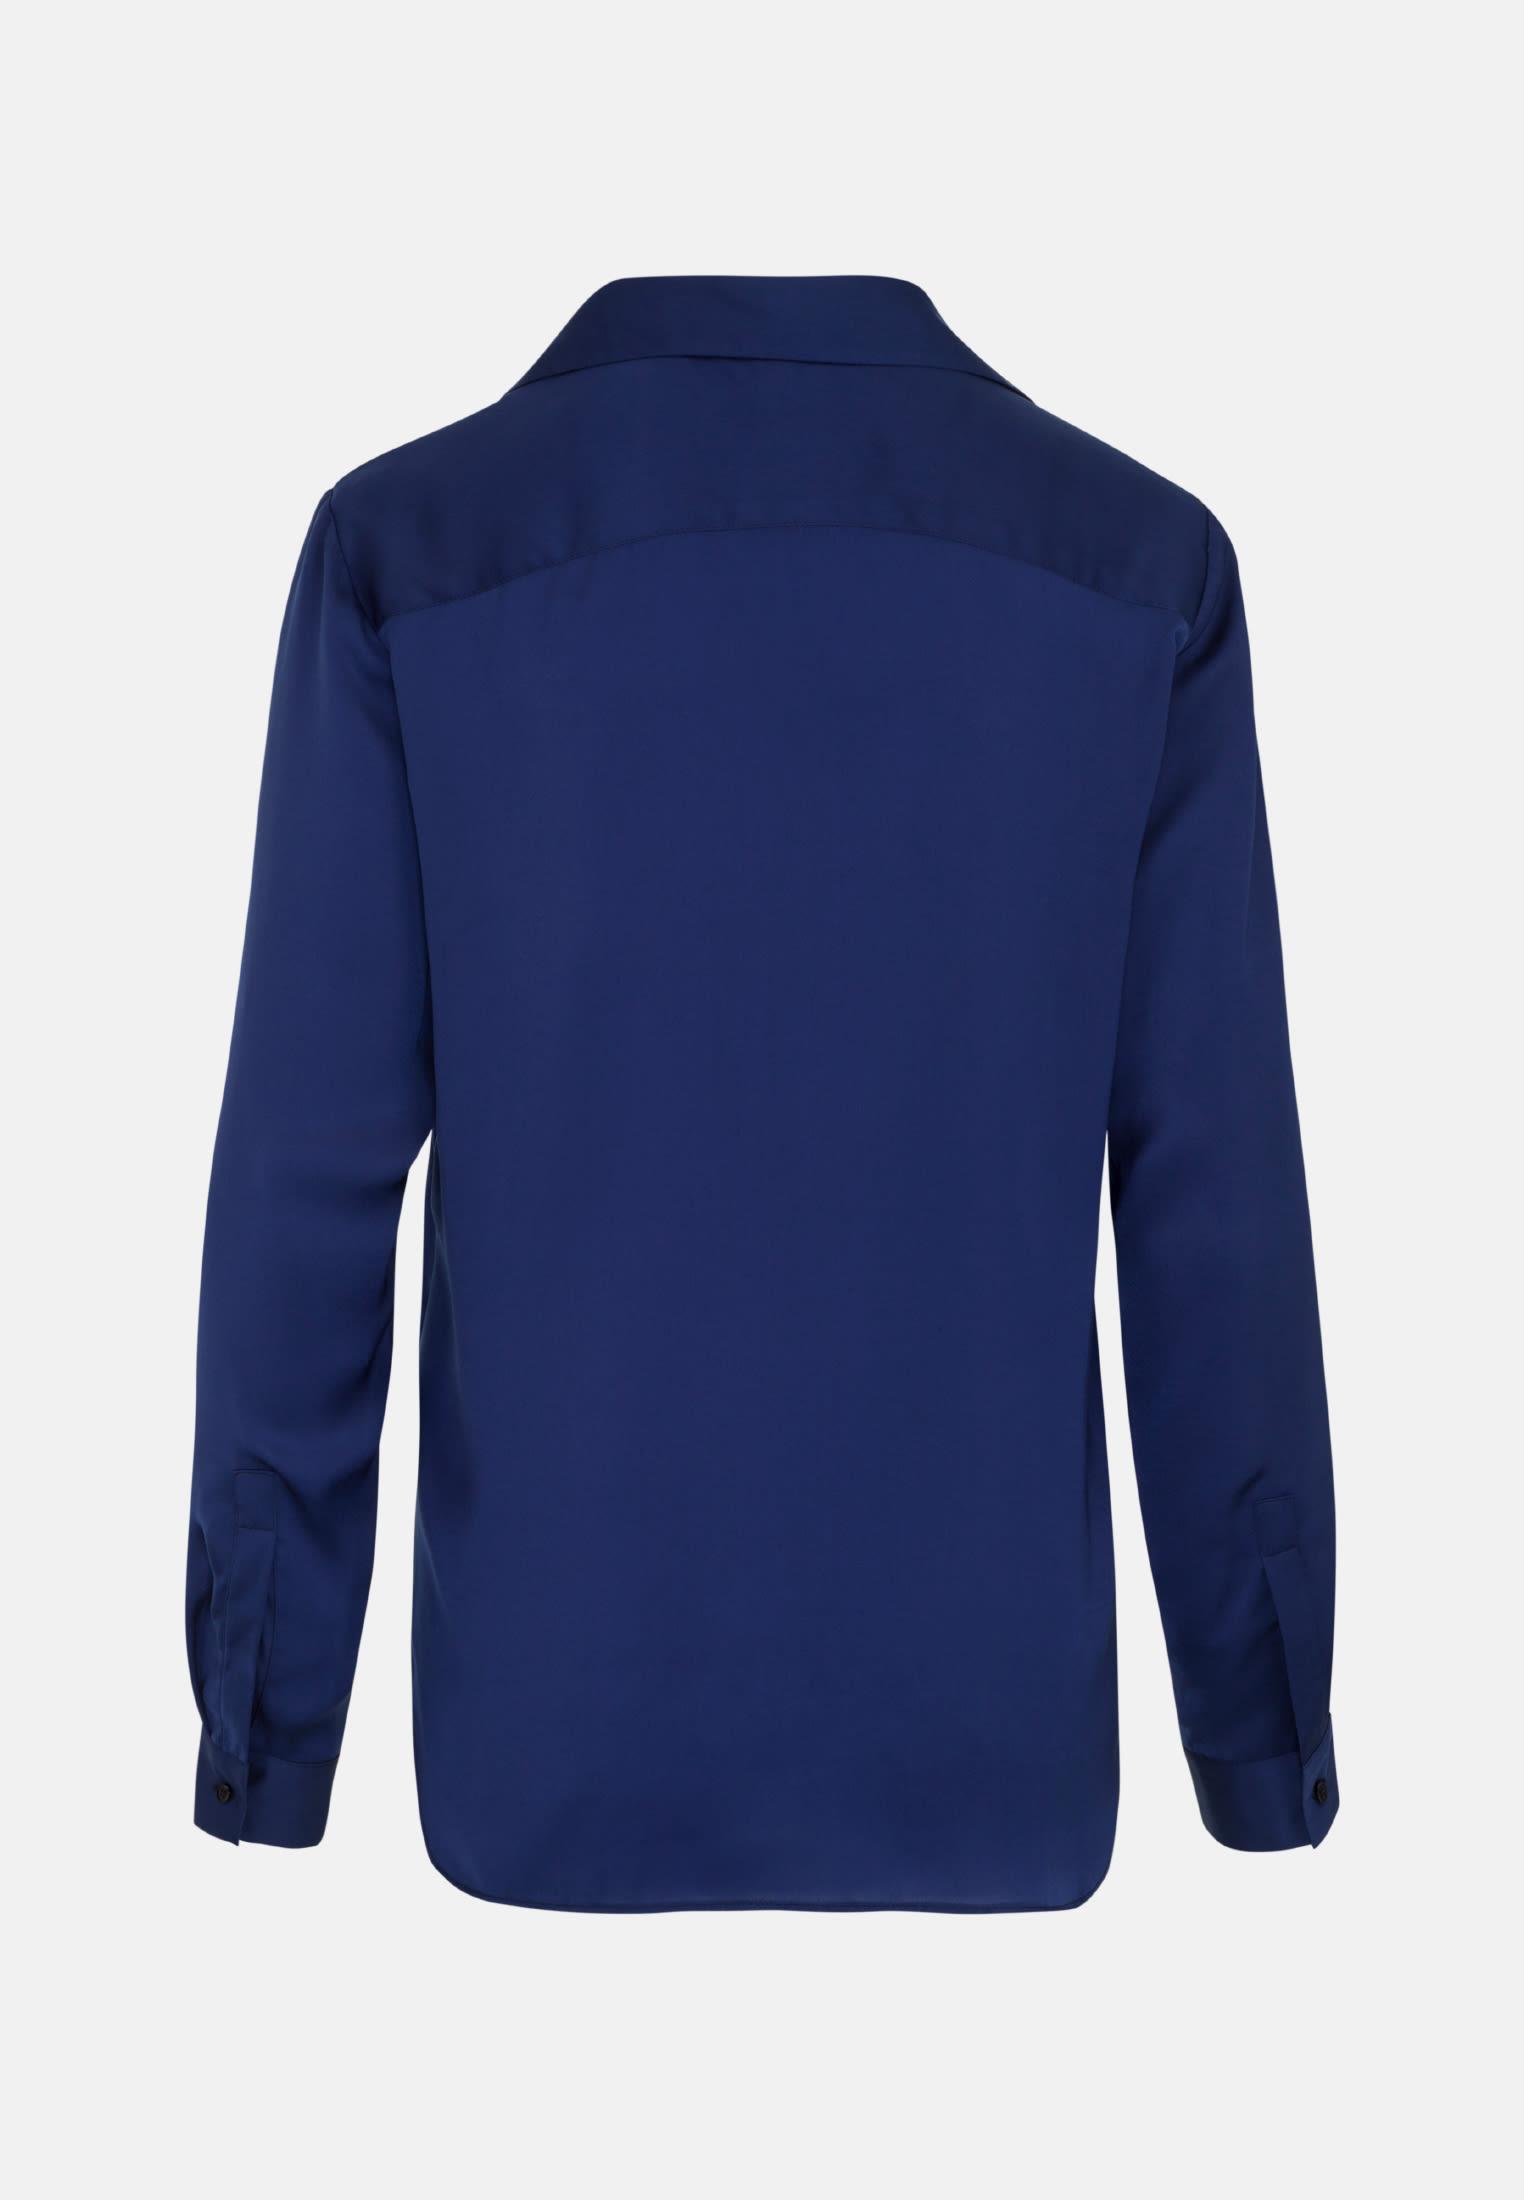 Satin Slip Over Blouse made of 100% Polyester in Dark blue |  Seidensticker Onlineshop